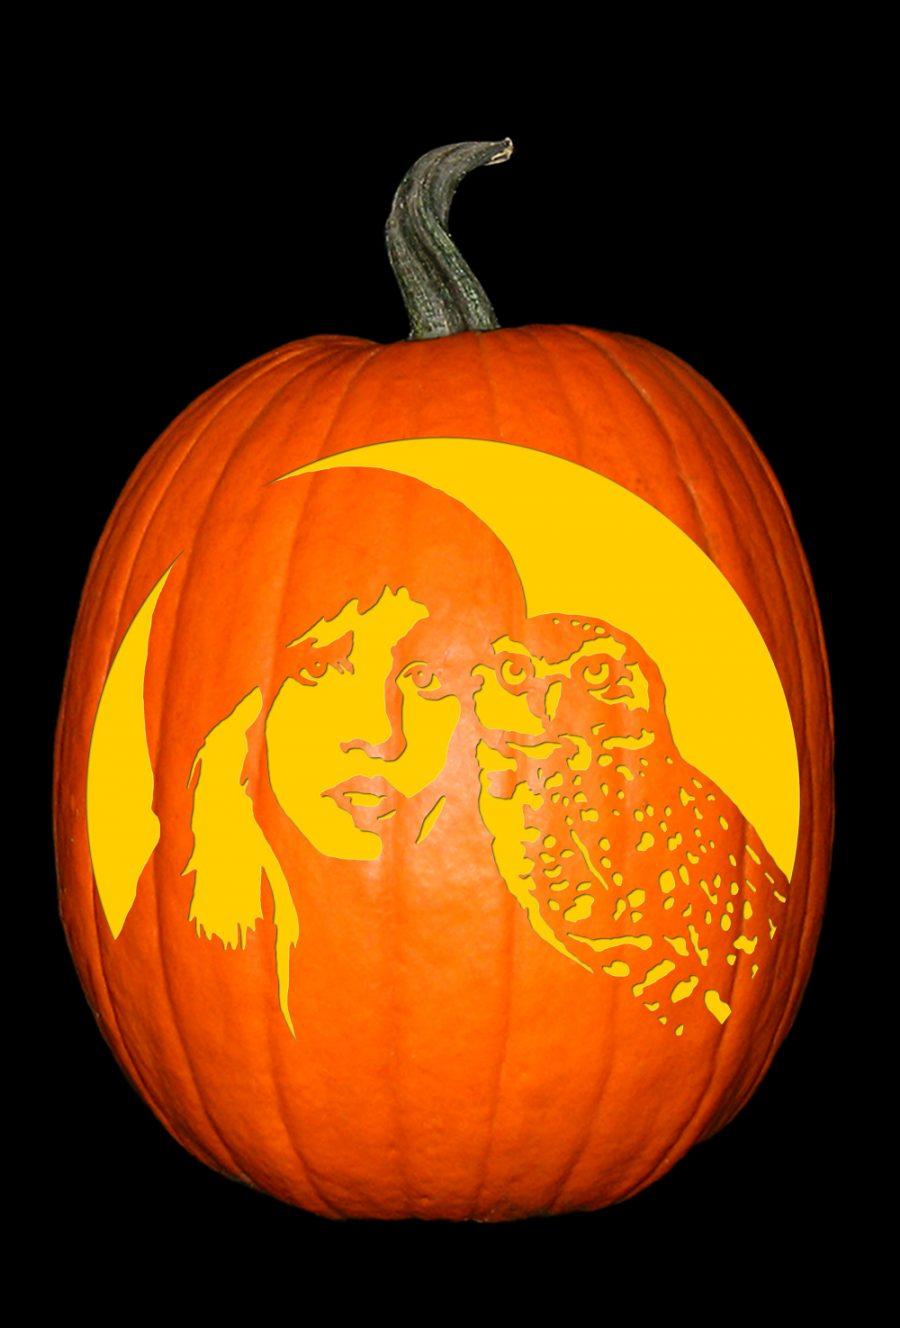 Stevie Nicks with Owl Pumpkin